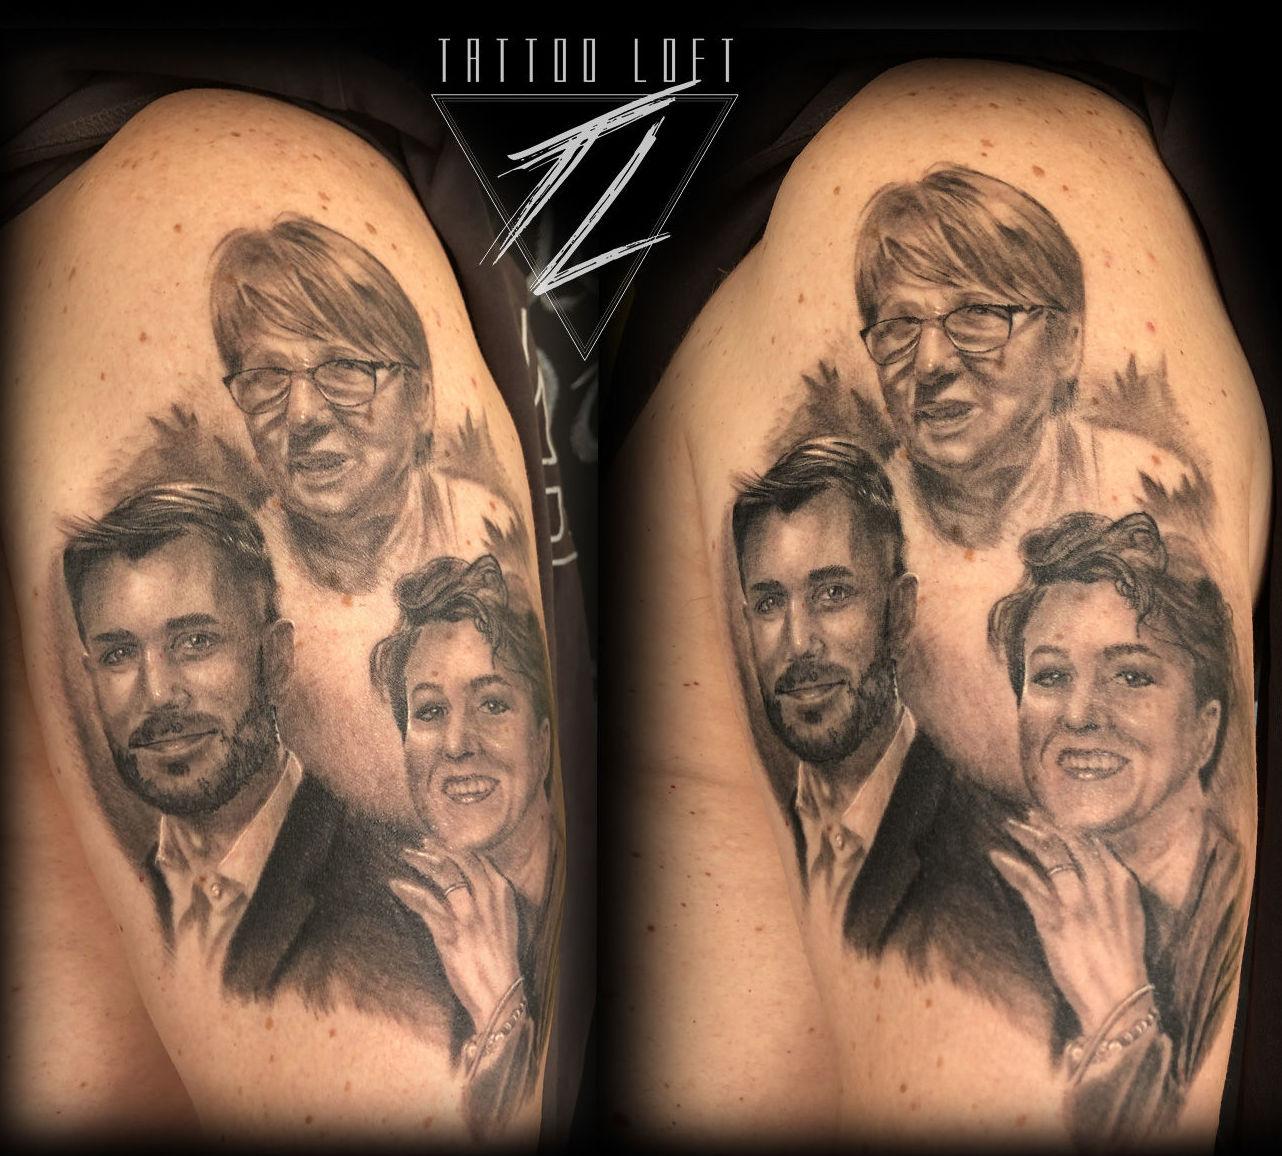 Foto 103 de Estudio artístico de tatuaje en    Tattoo Loft